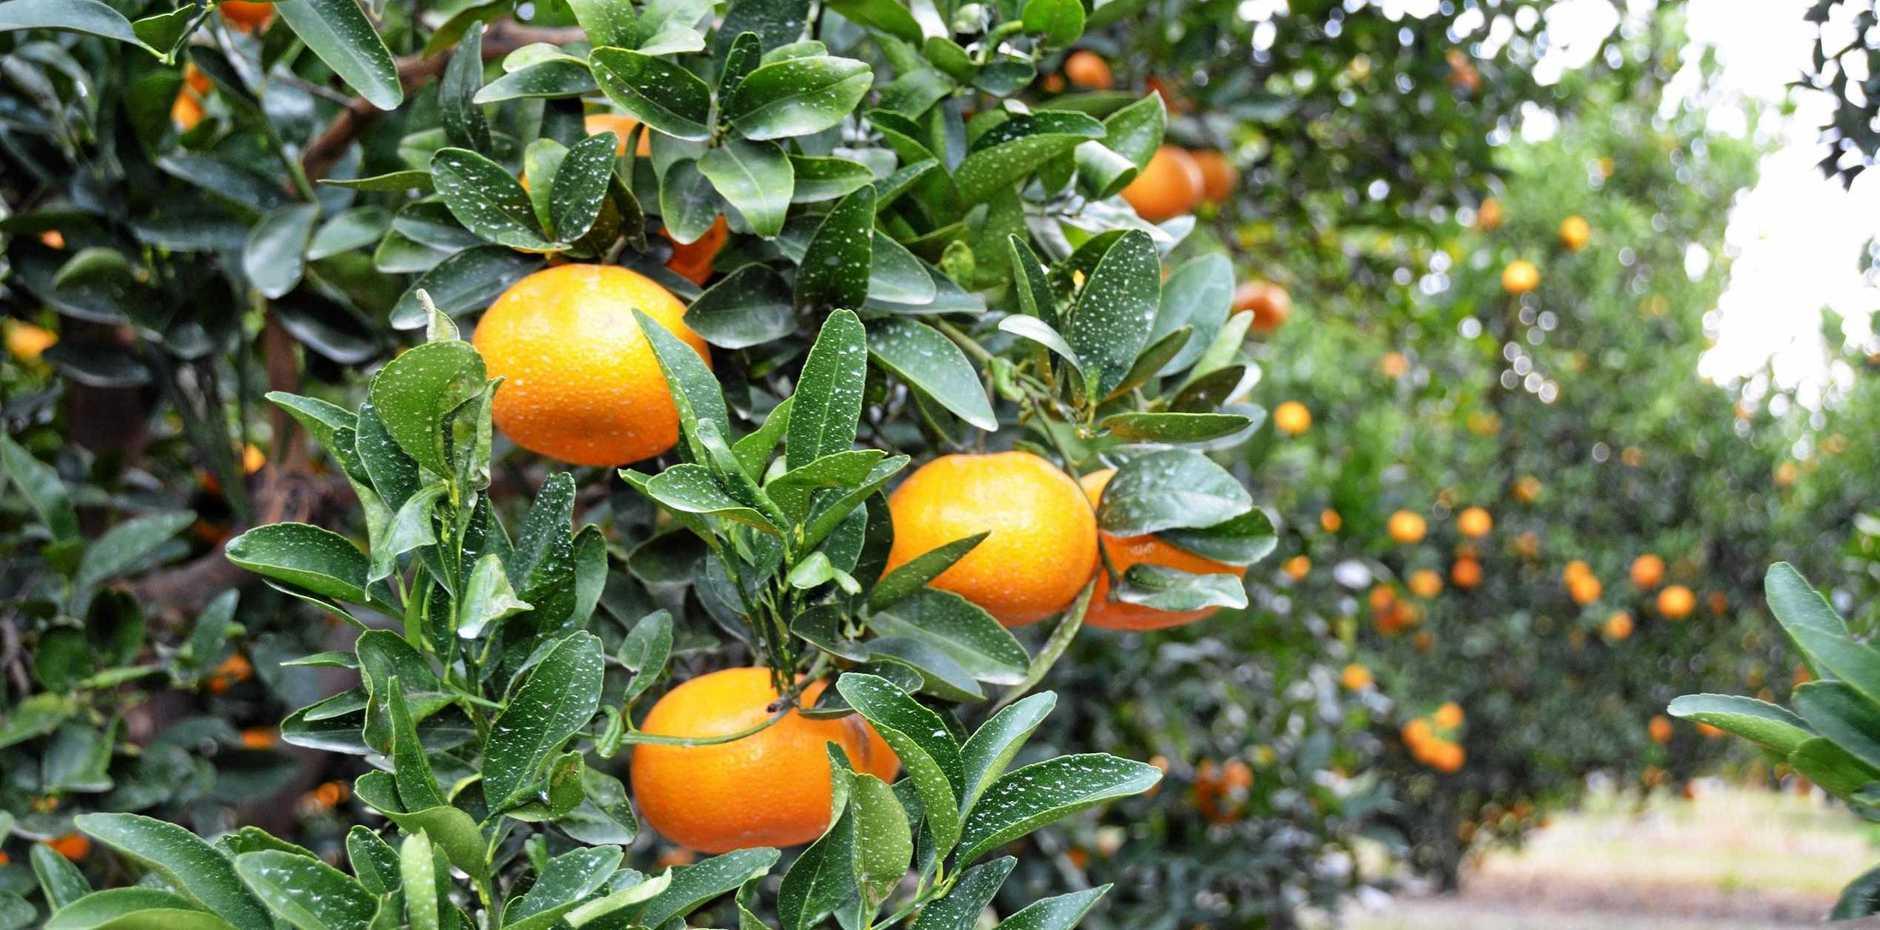 FREE OF DISEASE: North Burnett Murcott mandarins.